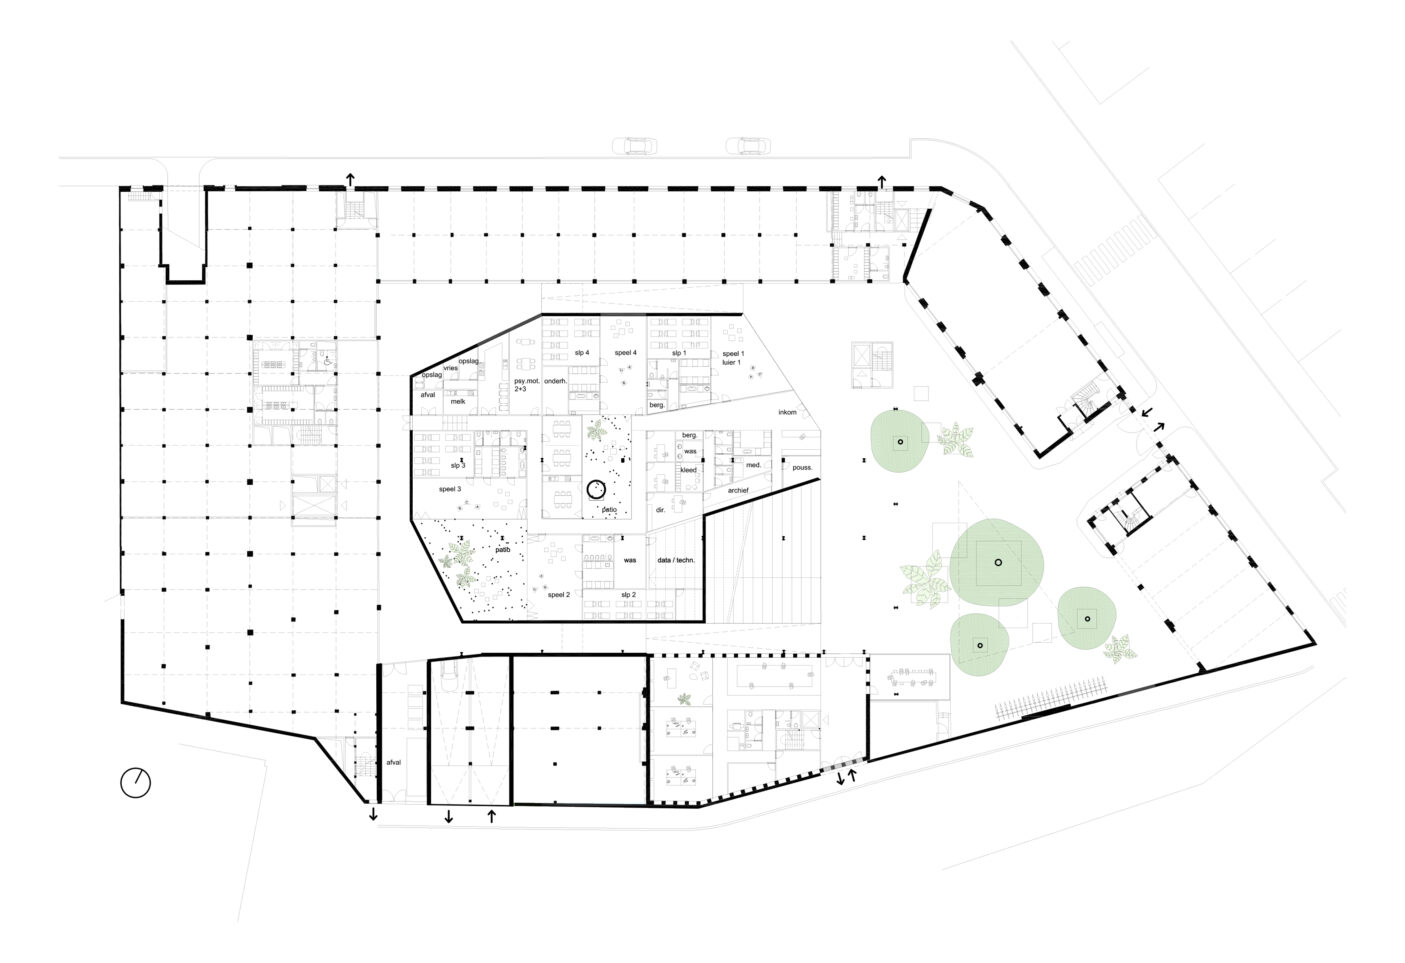 0913-plan-0-scaled.jpg